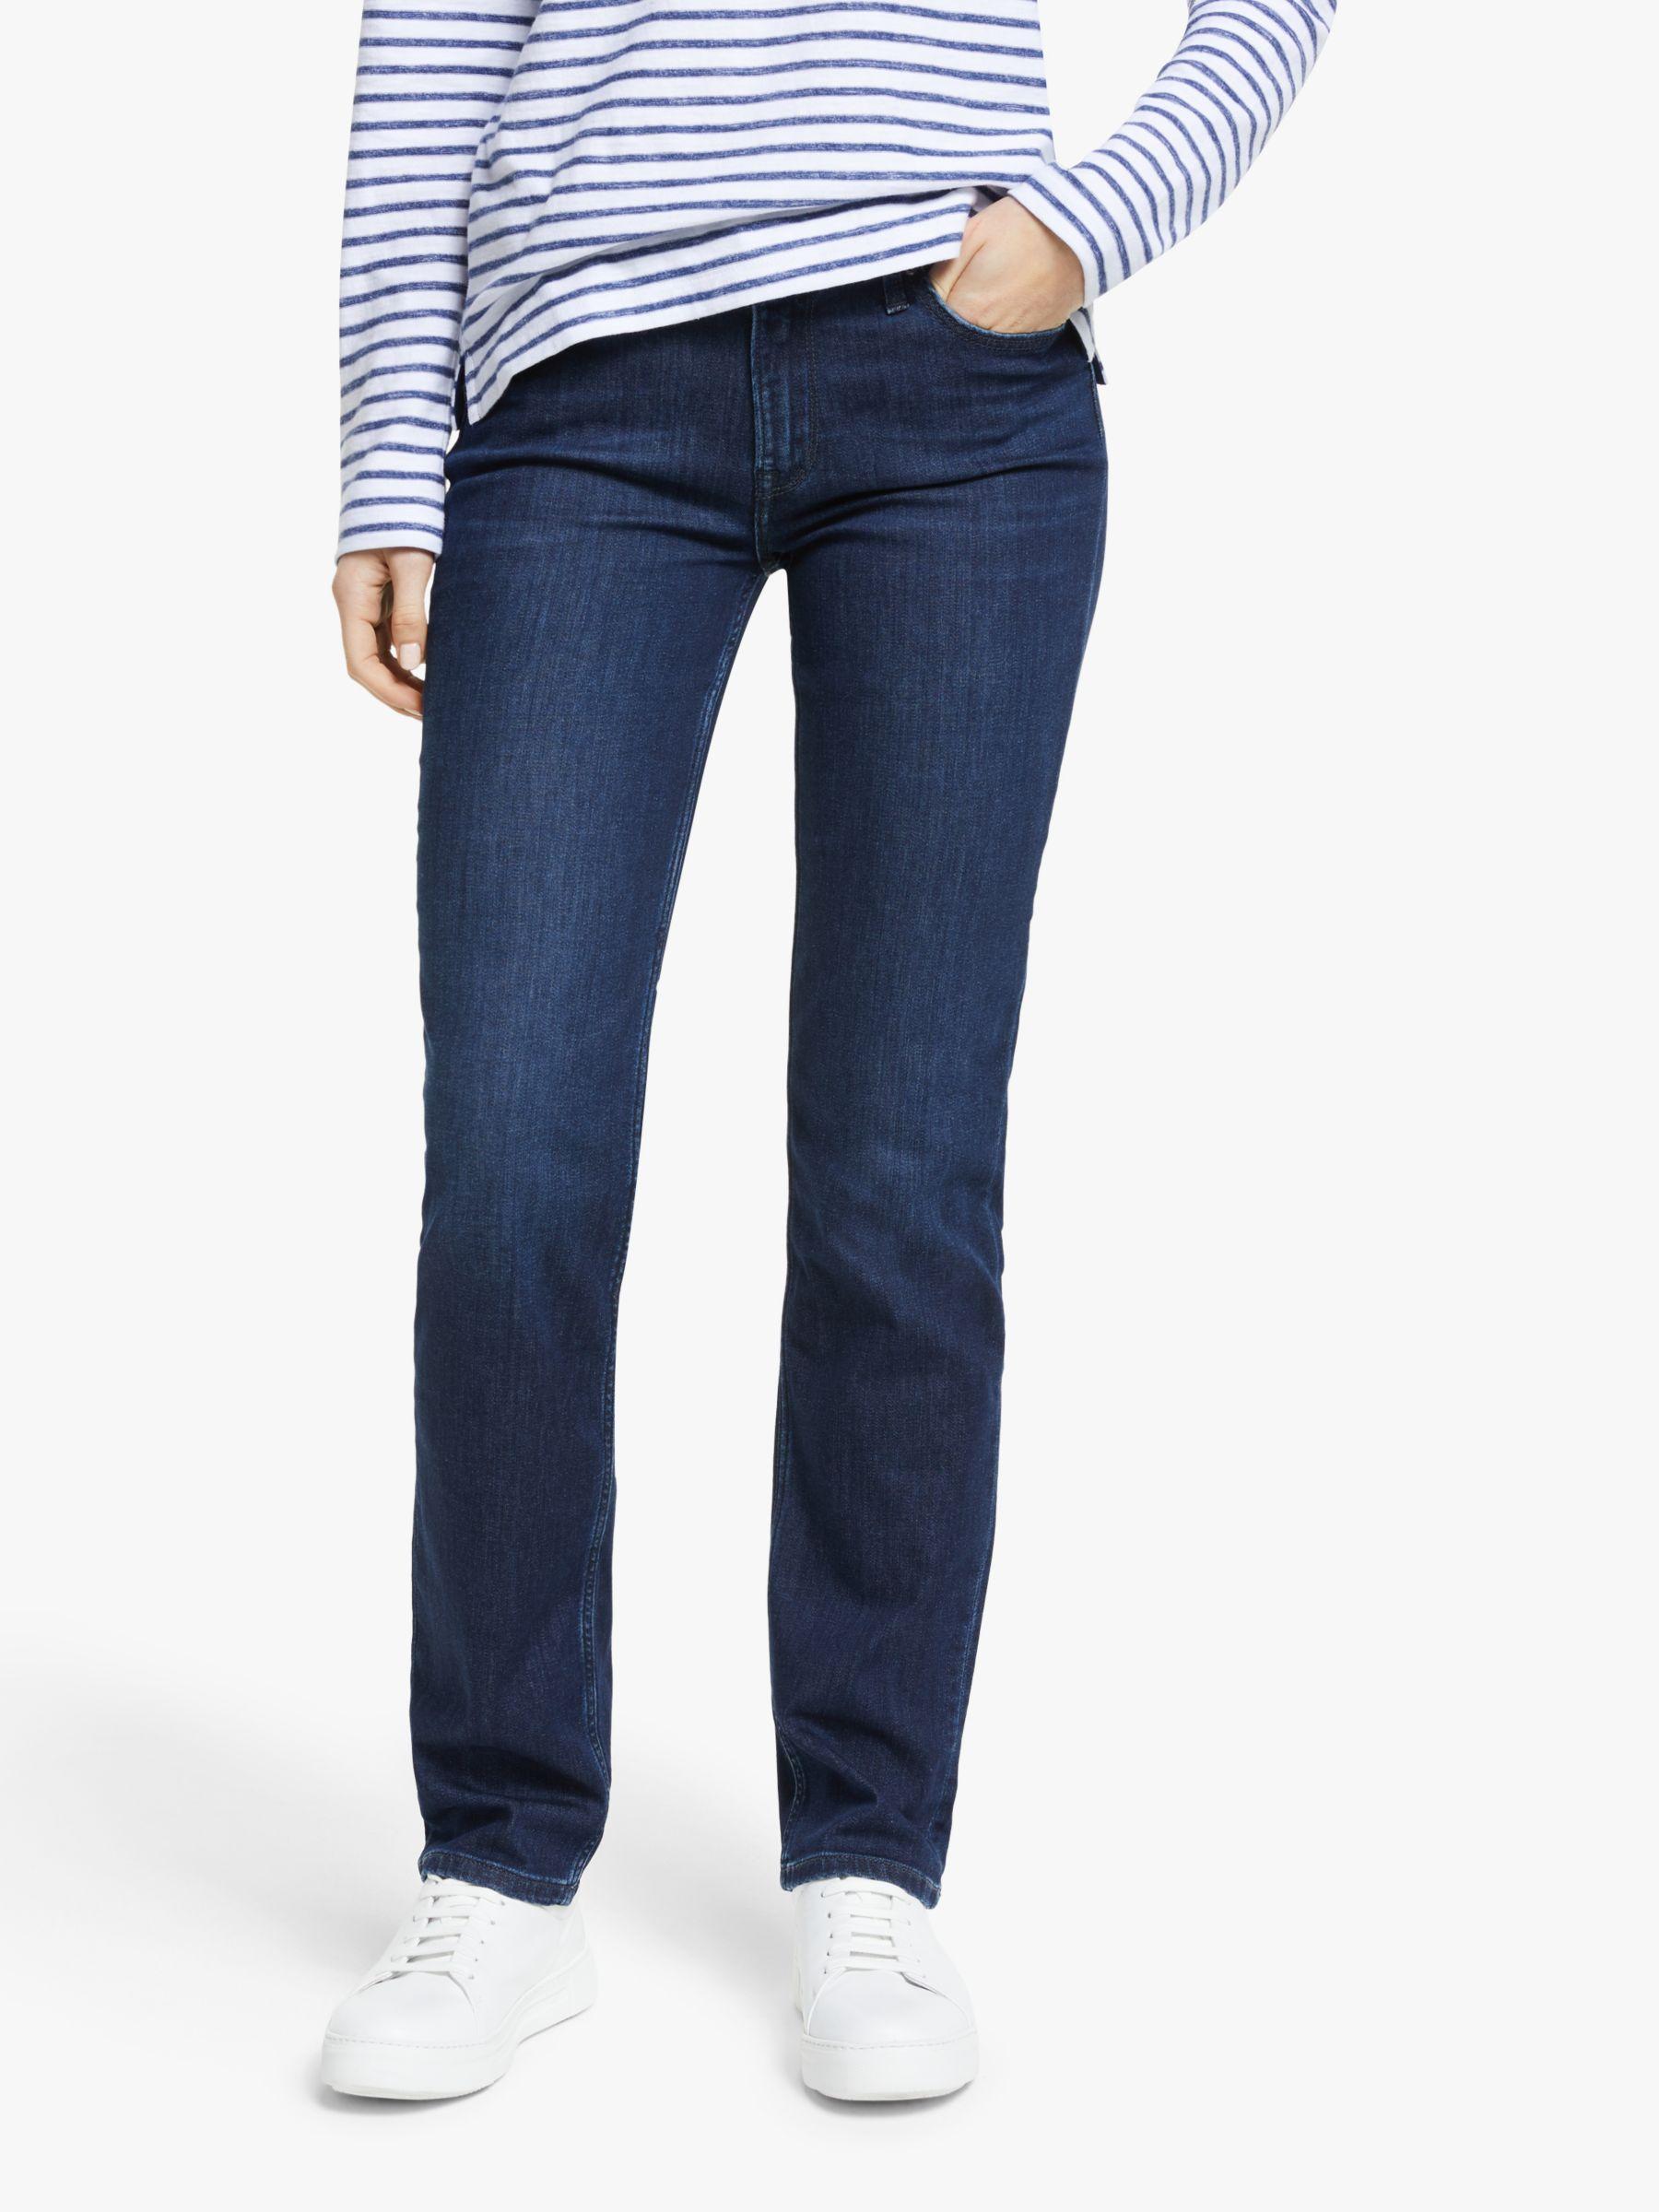 Lee Lee Marion Regular Straight Leg Jeans, Dark Truxel